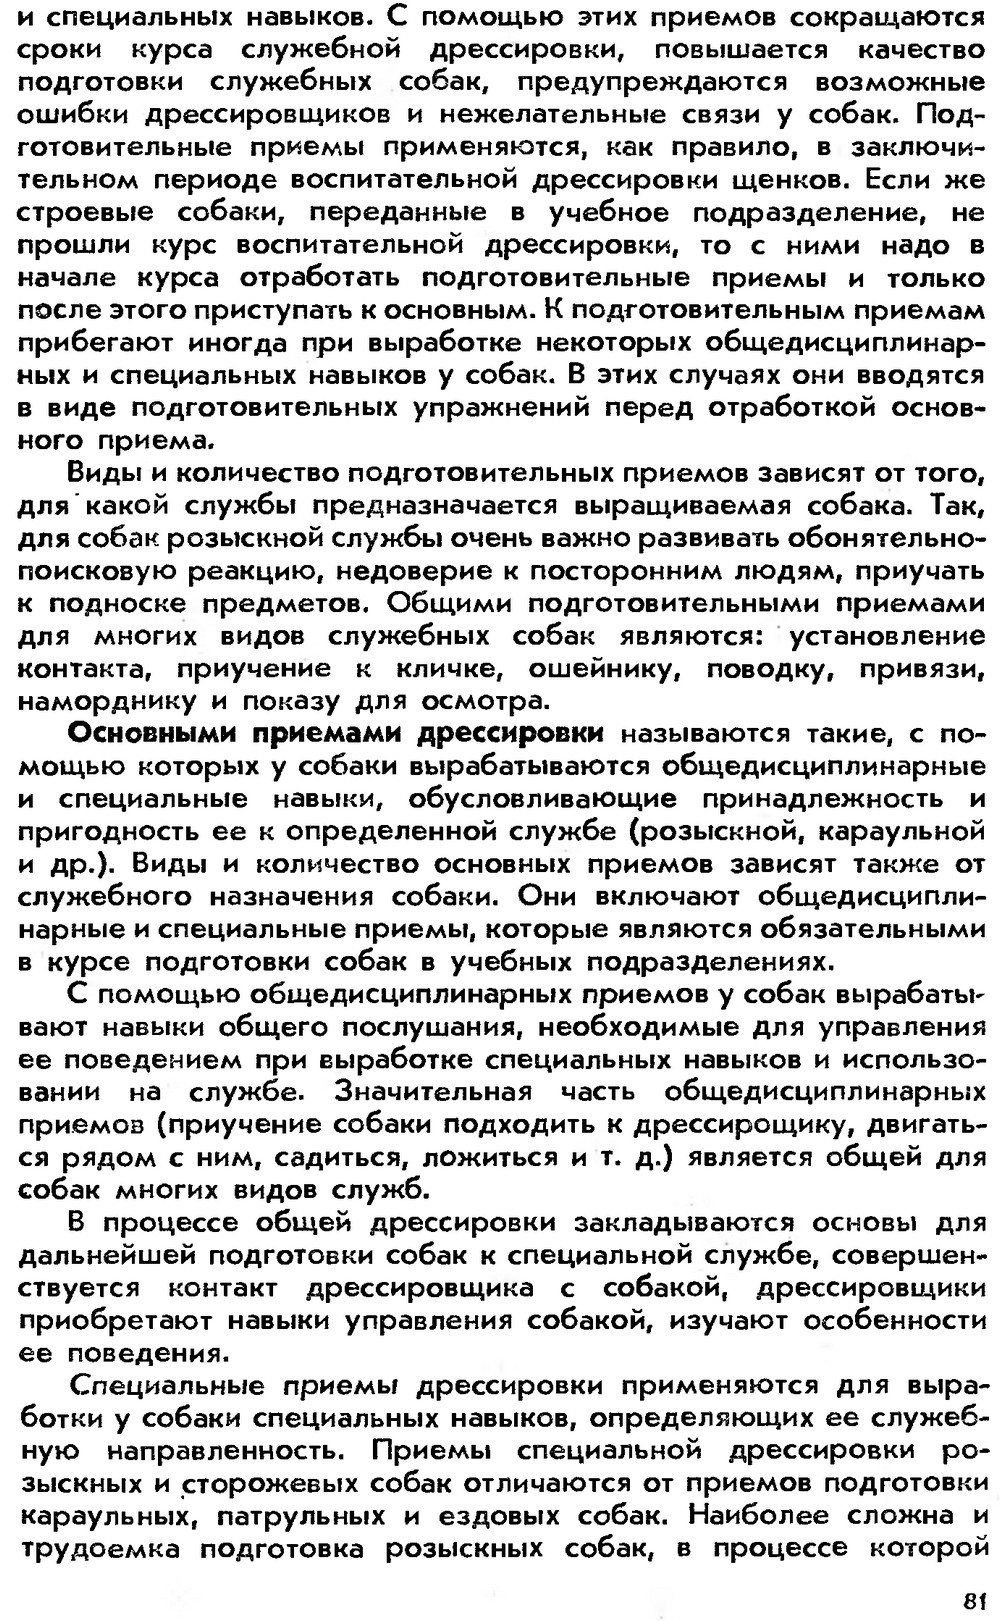 http://i5.imageban.ru/out/2014/01/15/ebfc387c853d8f3026fe343e4a835d4c.jpg